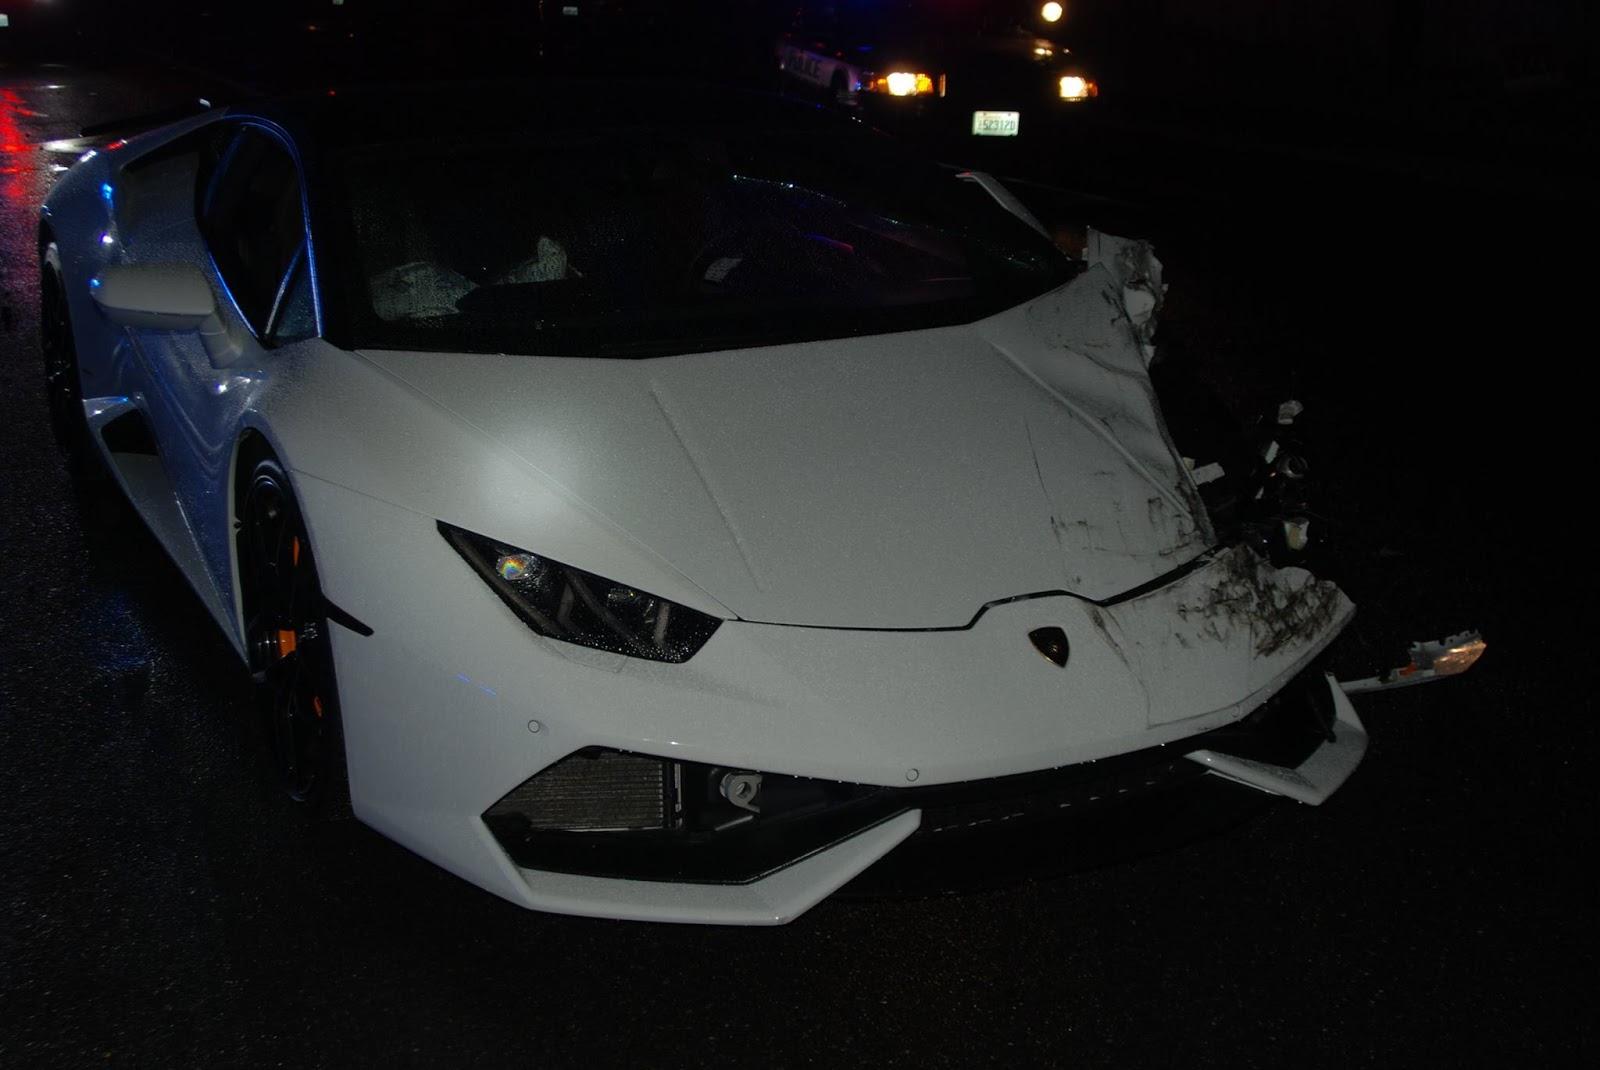 23 Year Old Crashes Rented Lamborghini Huracan In